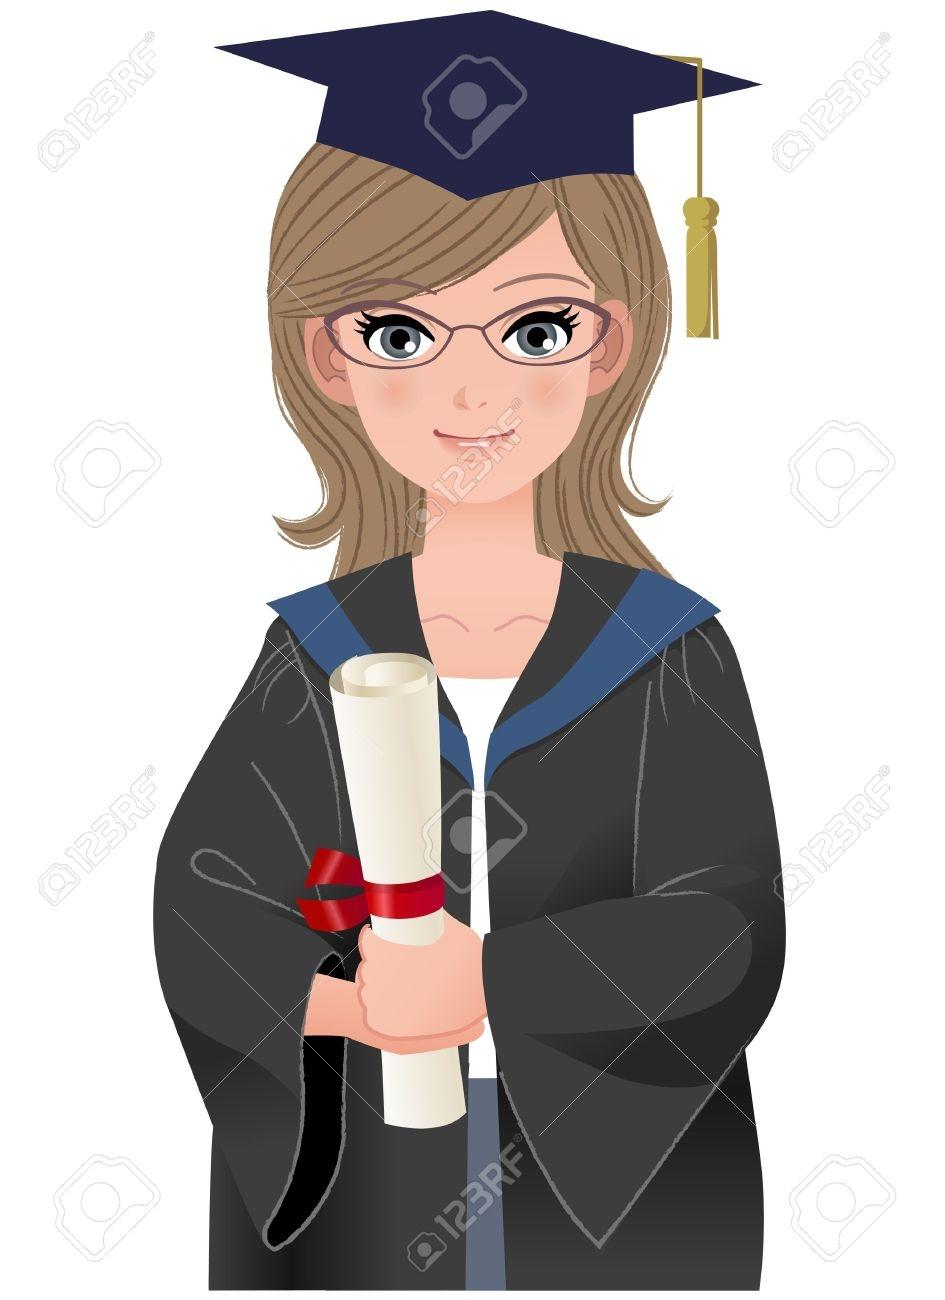 Graduation clipart college graduate Clip graduate Free Collection Graduation